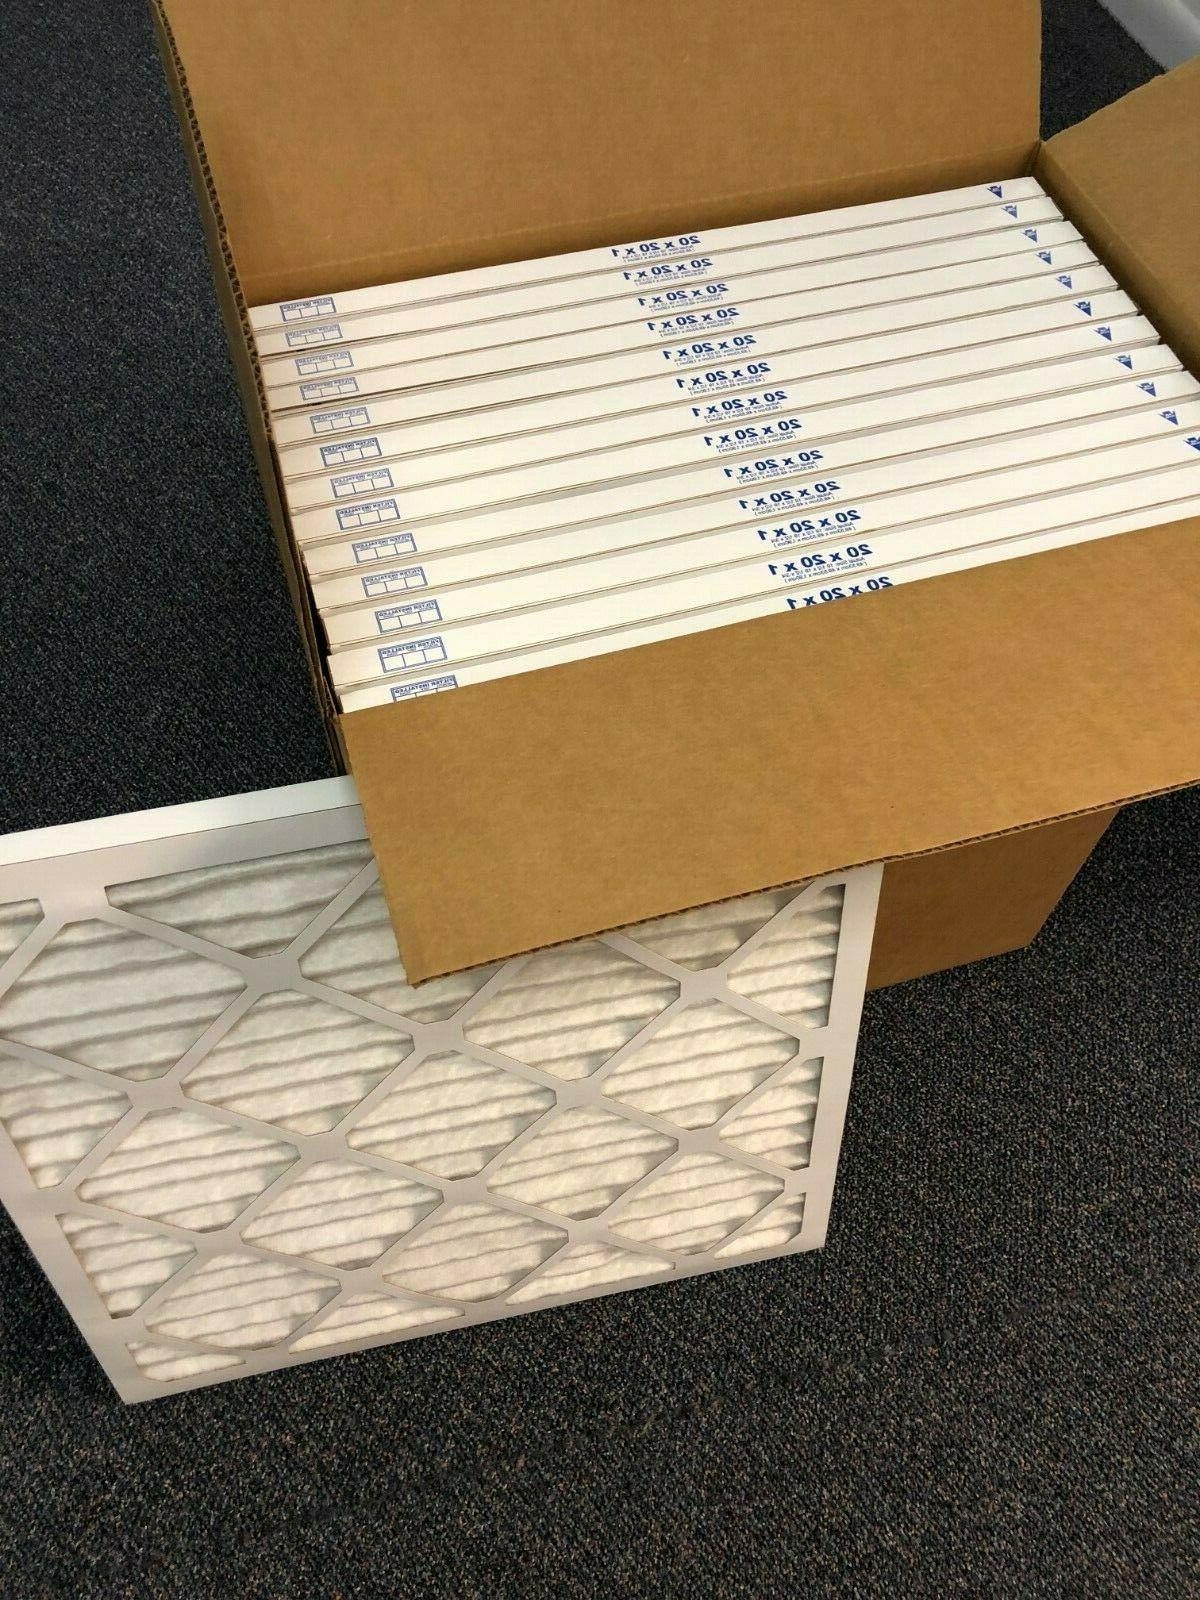 20x20x1 merv 13 pleated ac furnace filters